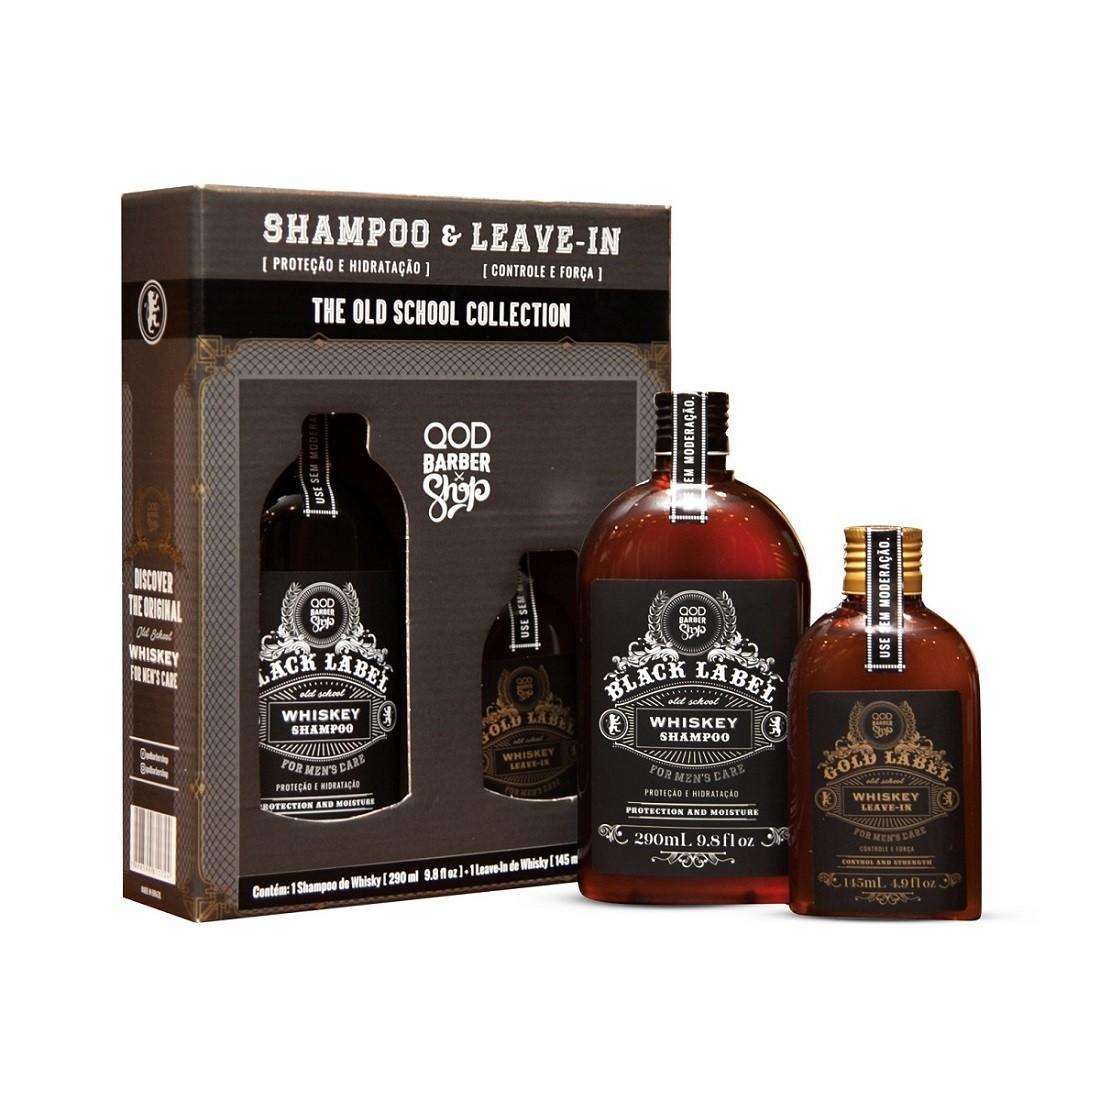 Kit Shampoo Whiskey + Leave-in Whiskey QOD Barber Shop